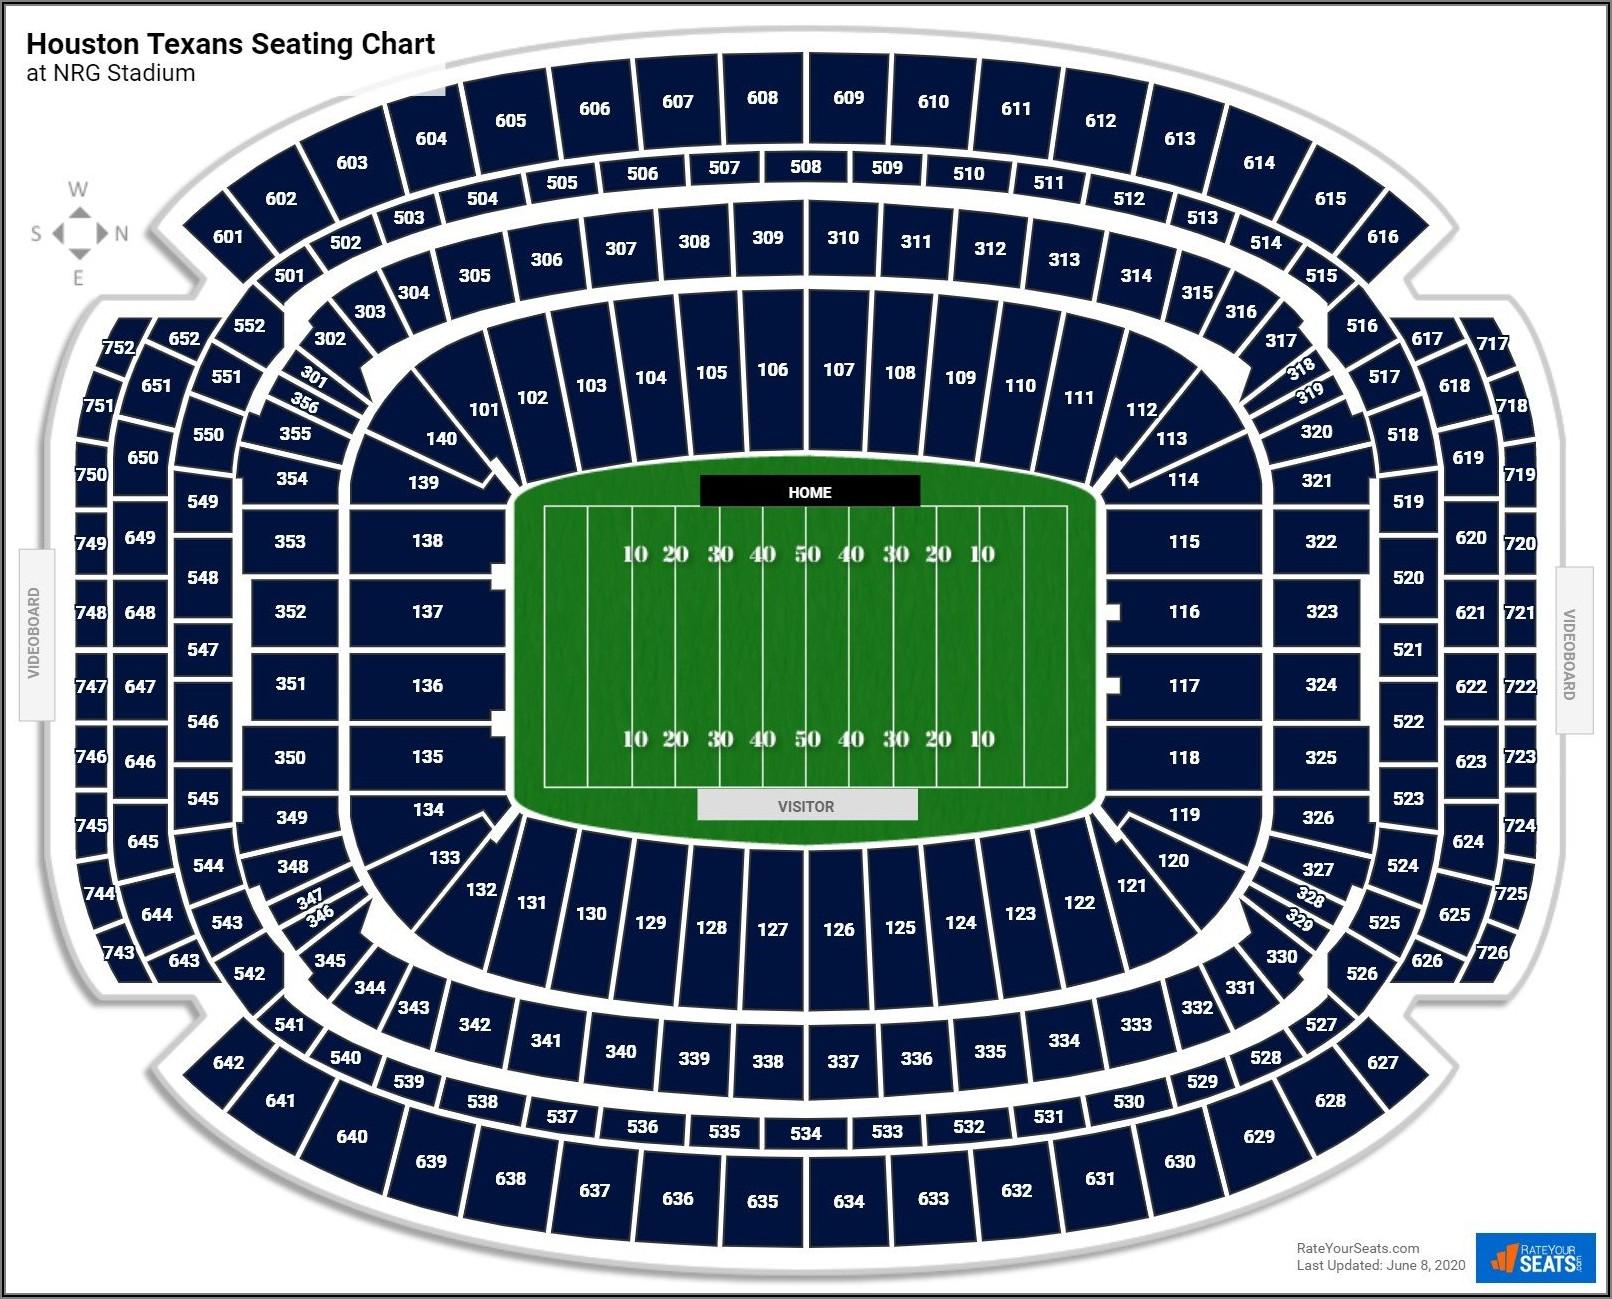 Nrg Stadium Seating Chart Virtual View